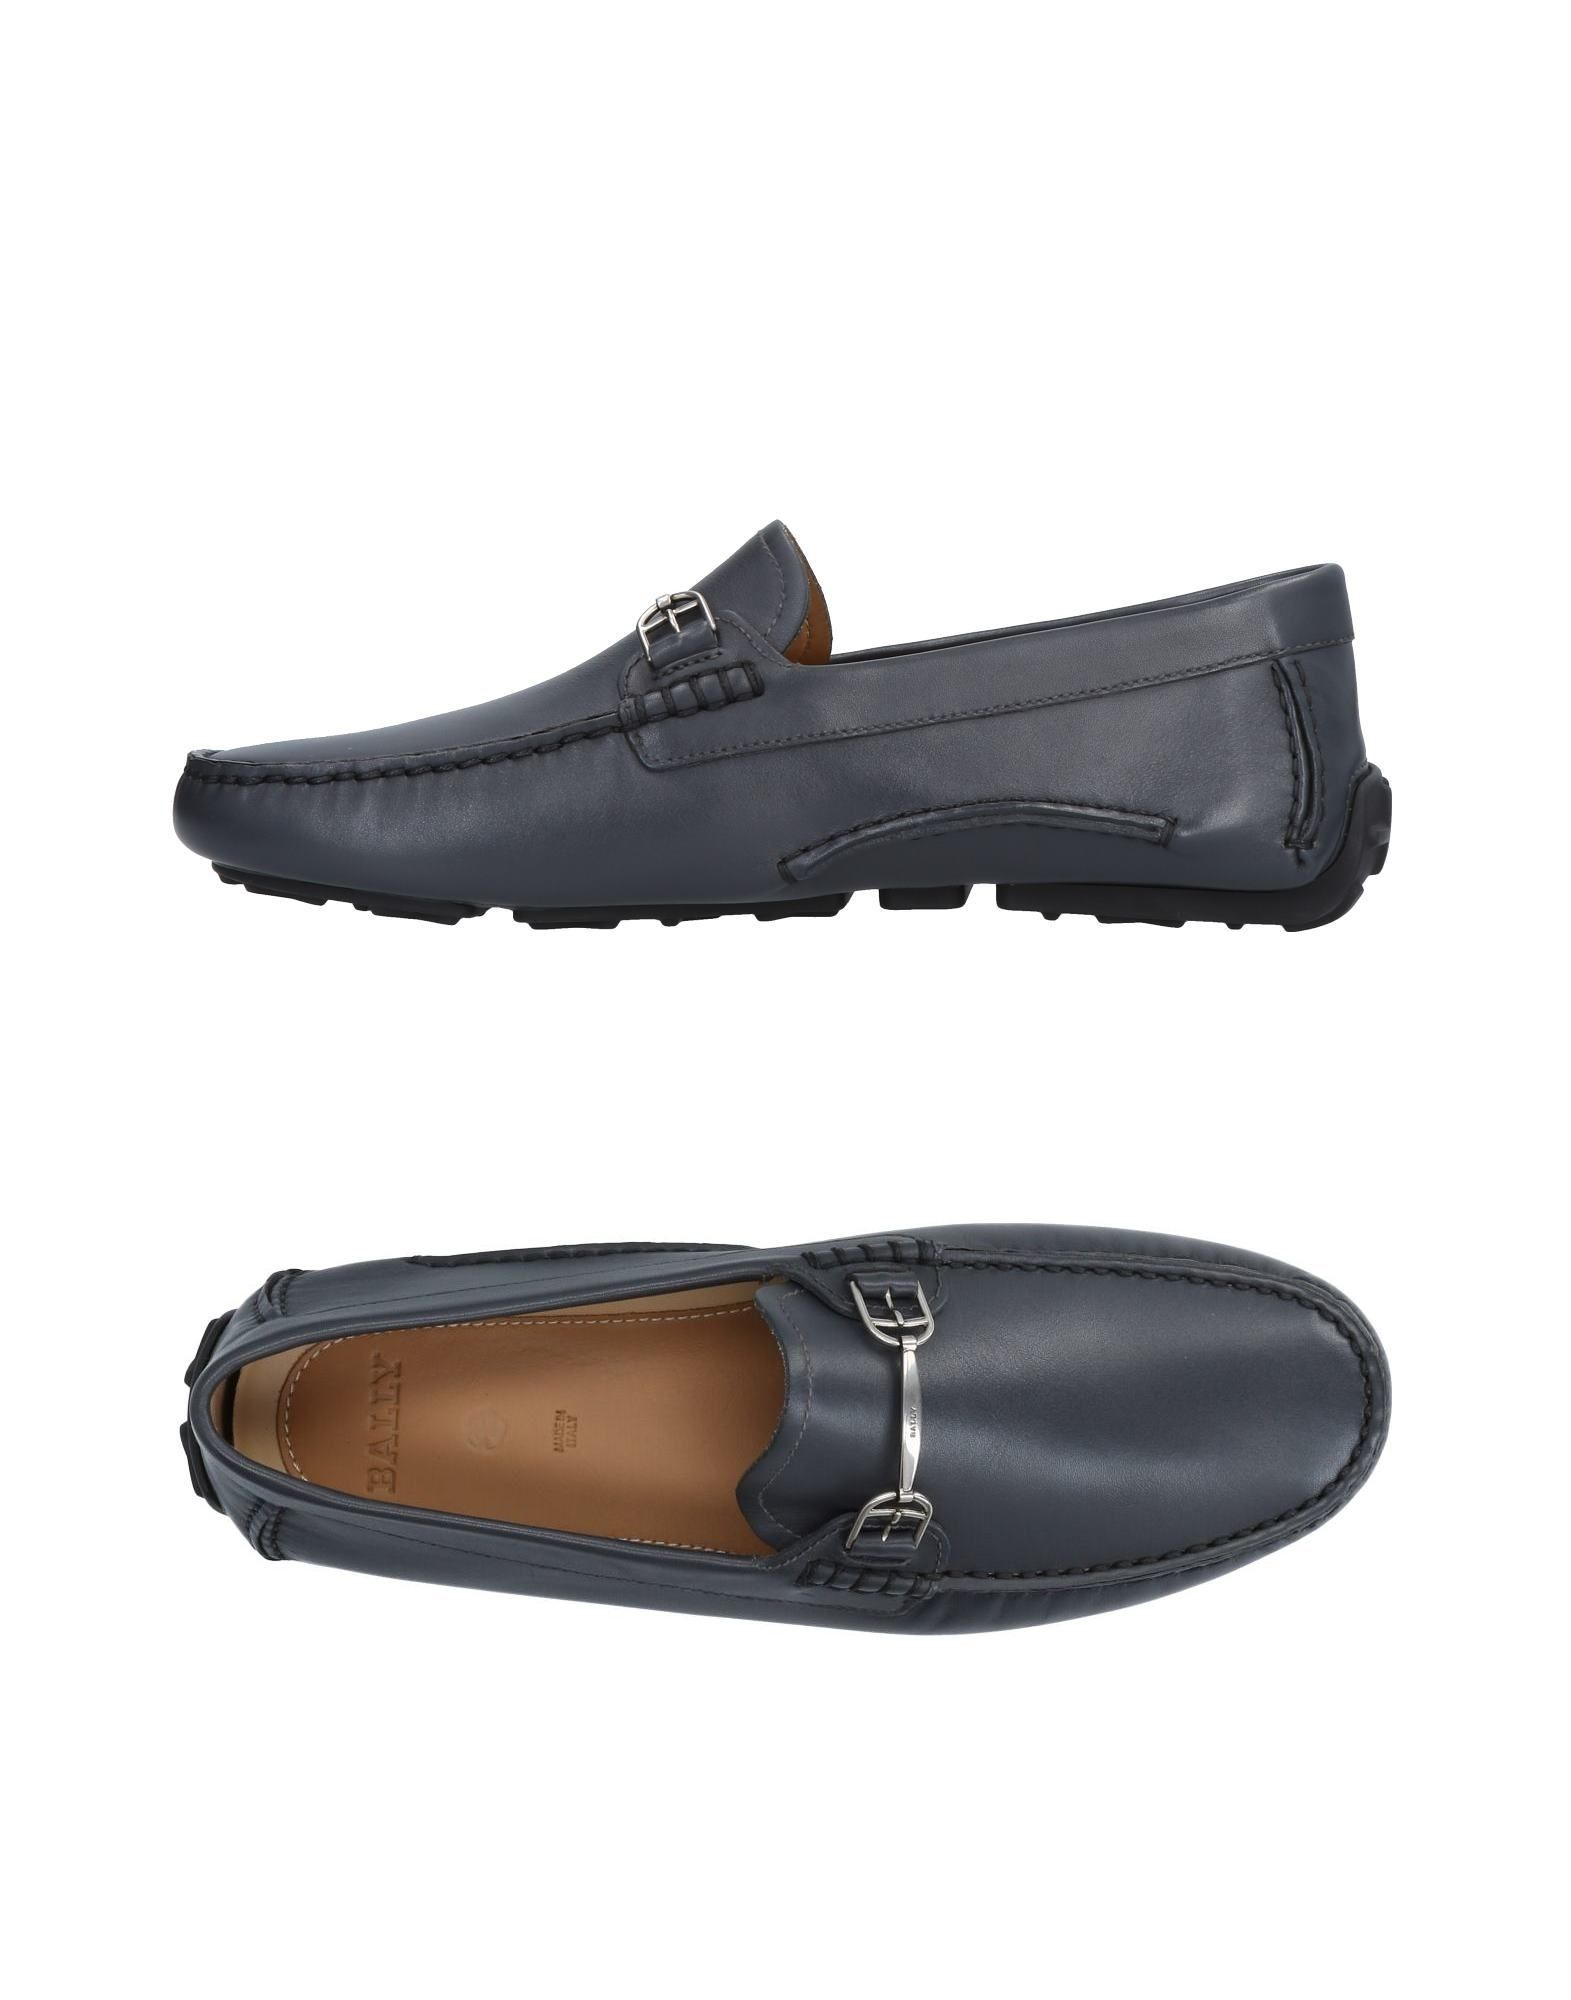 Bally Mokassins Herren  11475250LV Gute Qualität beliebte Schuhe